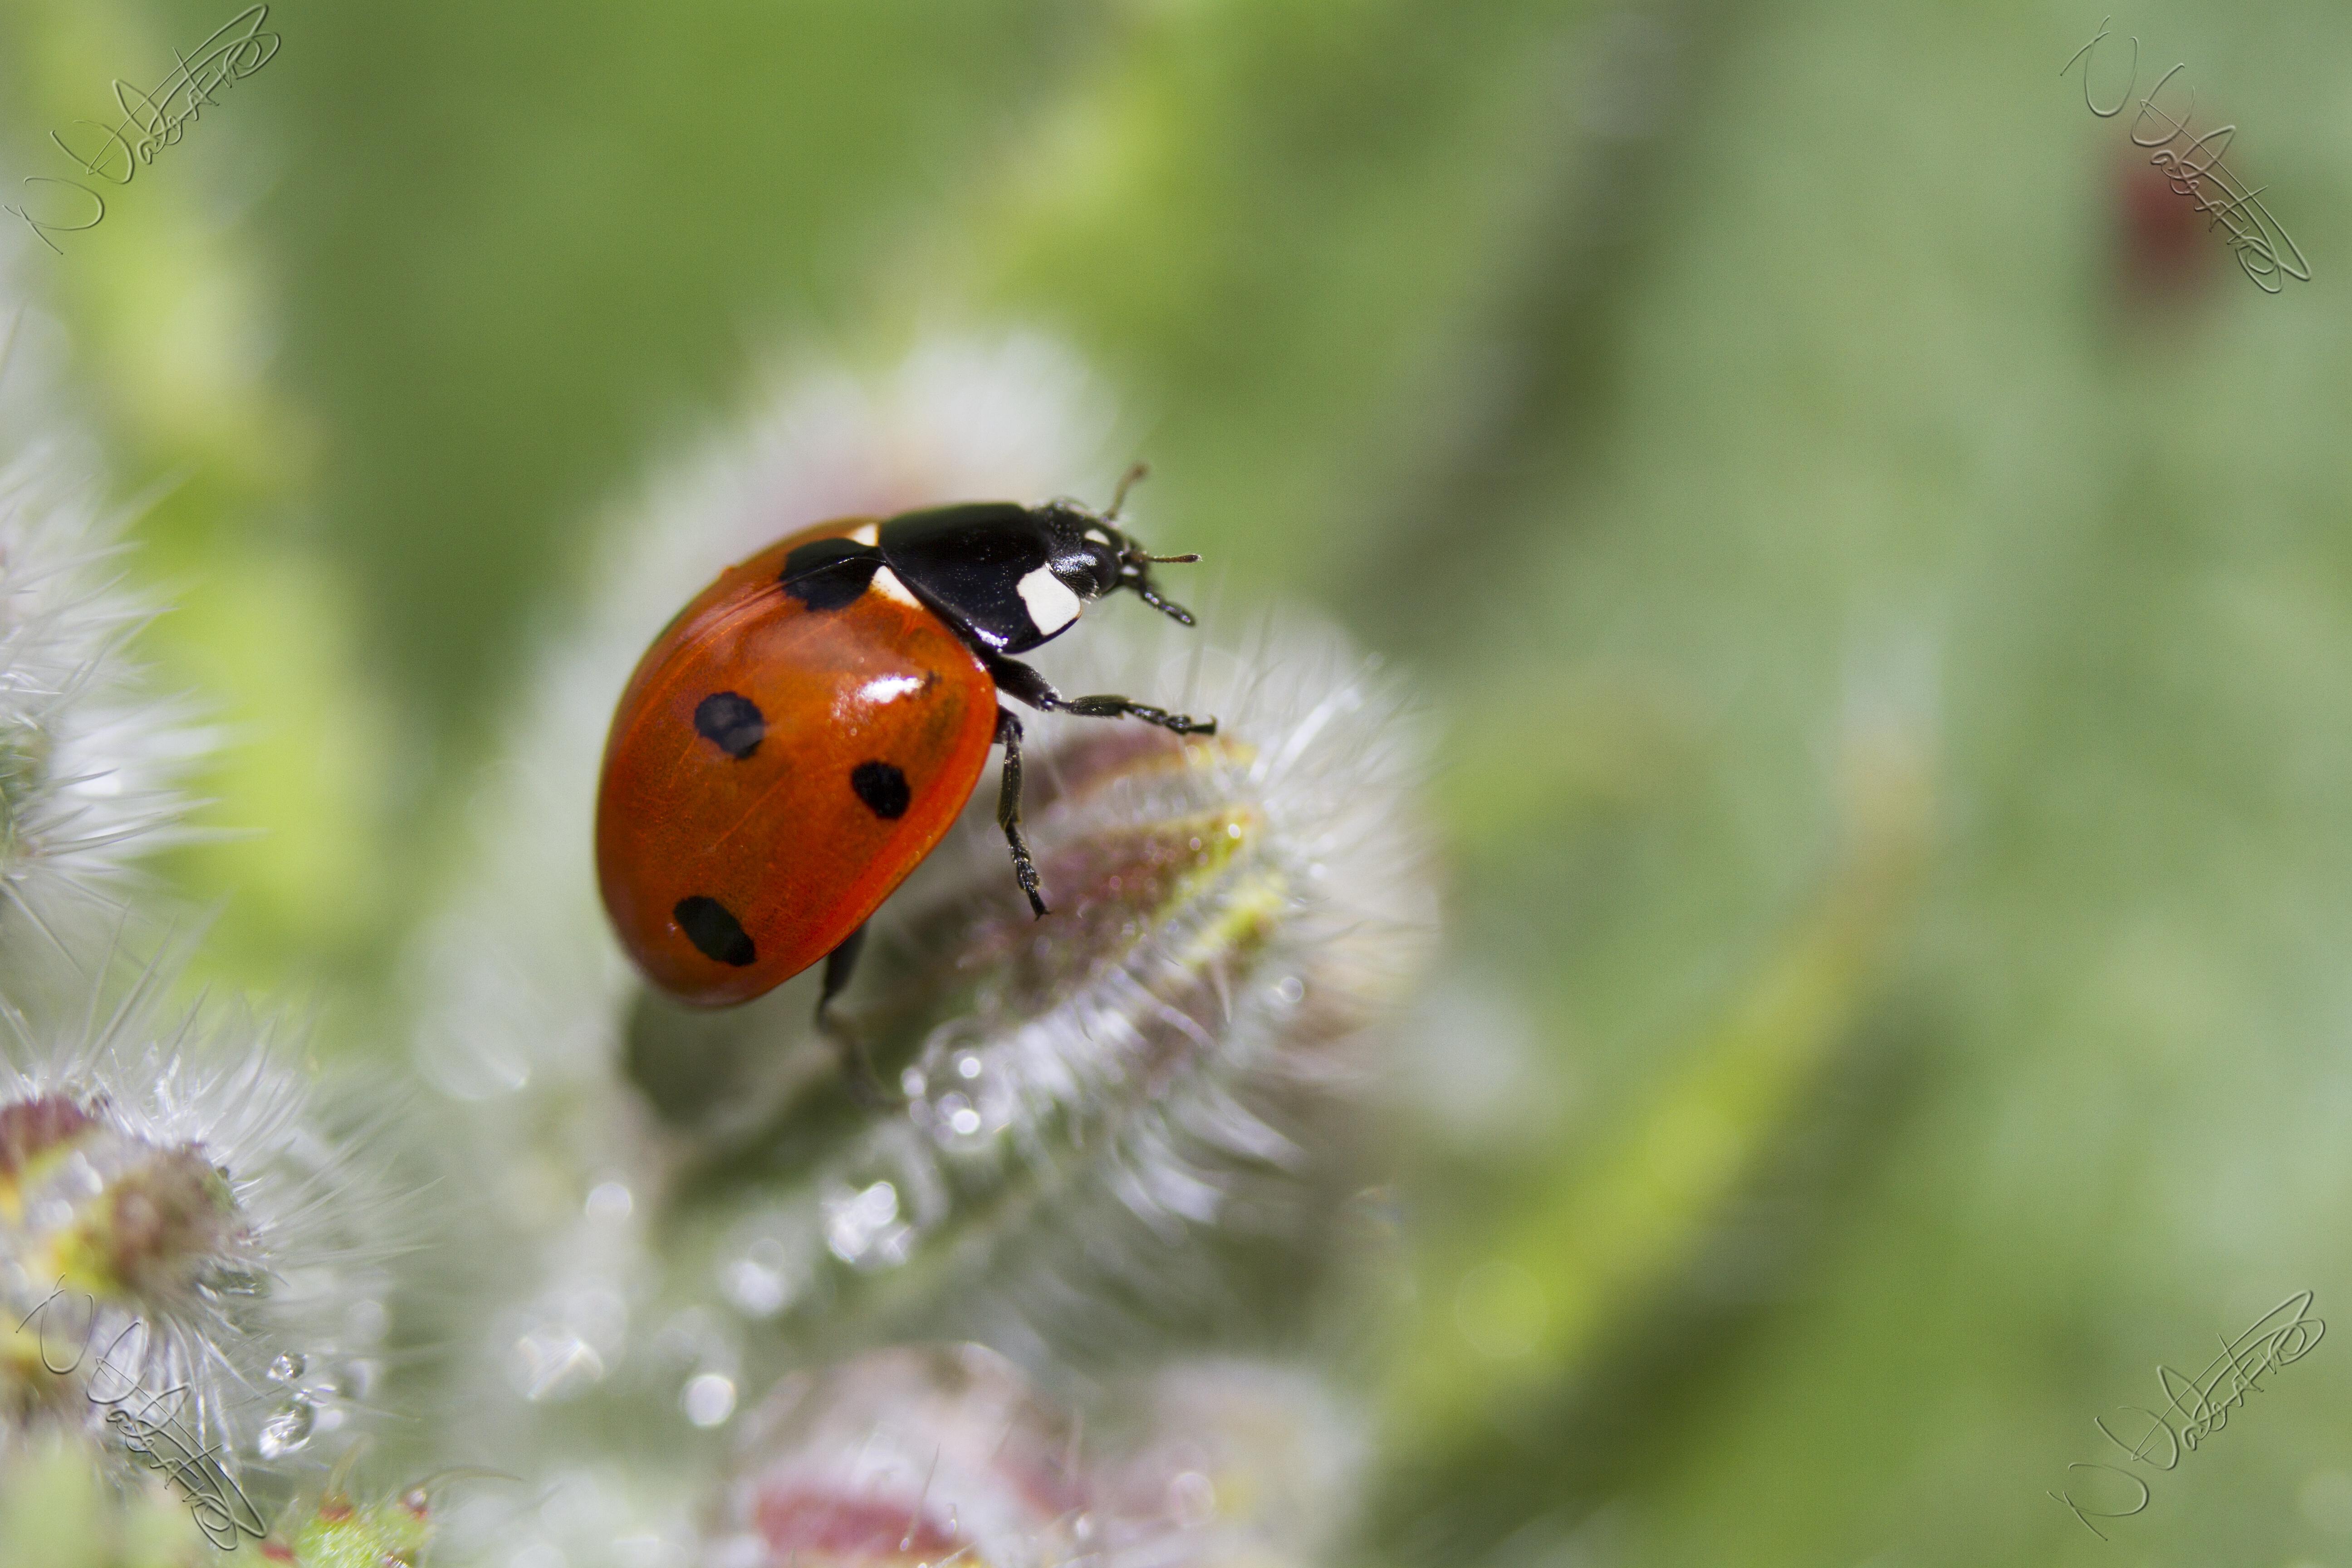 Bokeh Photography Flower Insect Macro Ladybug Garden Fauna Ladybird  Invertebrate Close Up Outdoors Uk Dof Beetle